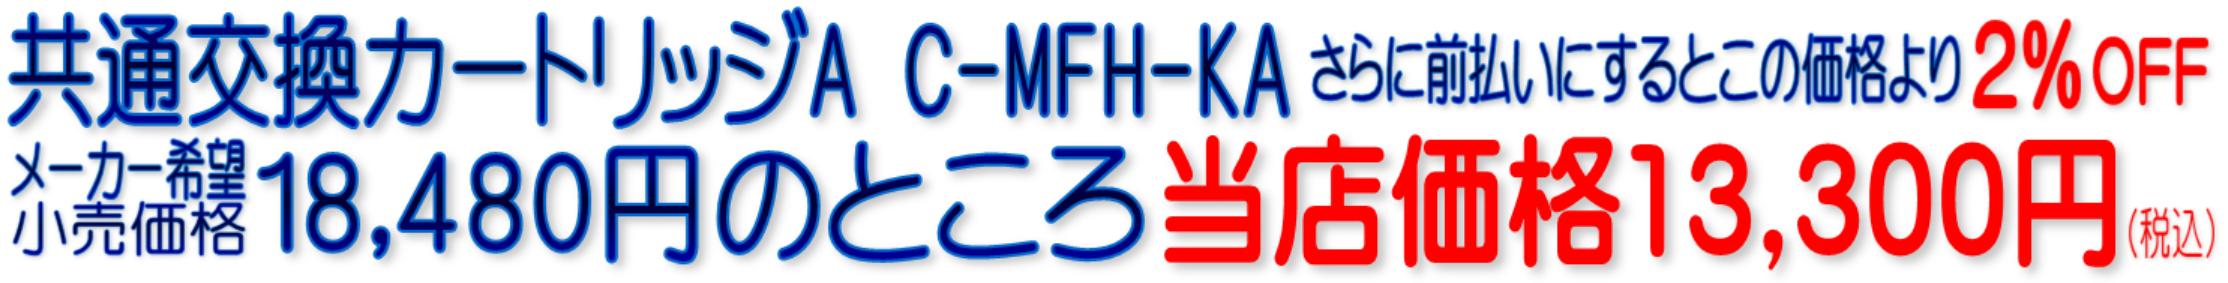 C-MFH-KA